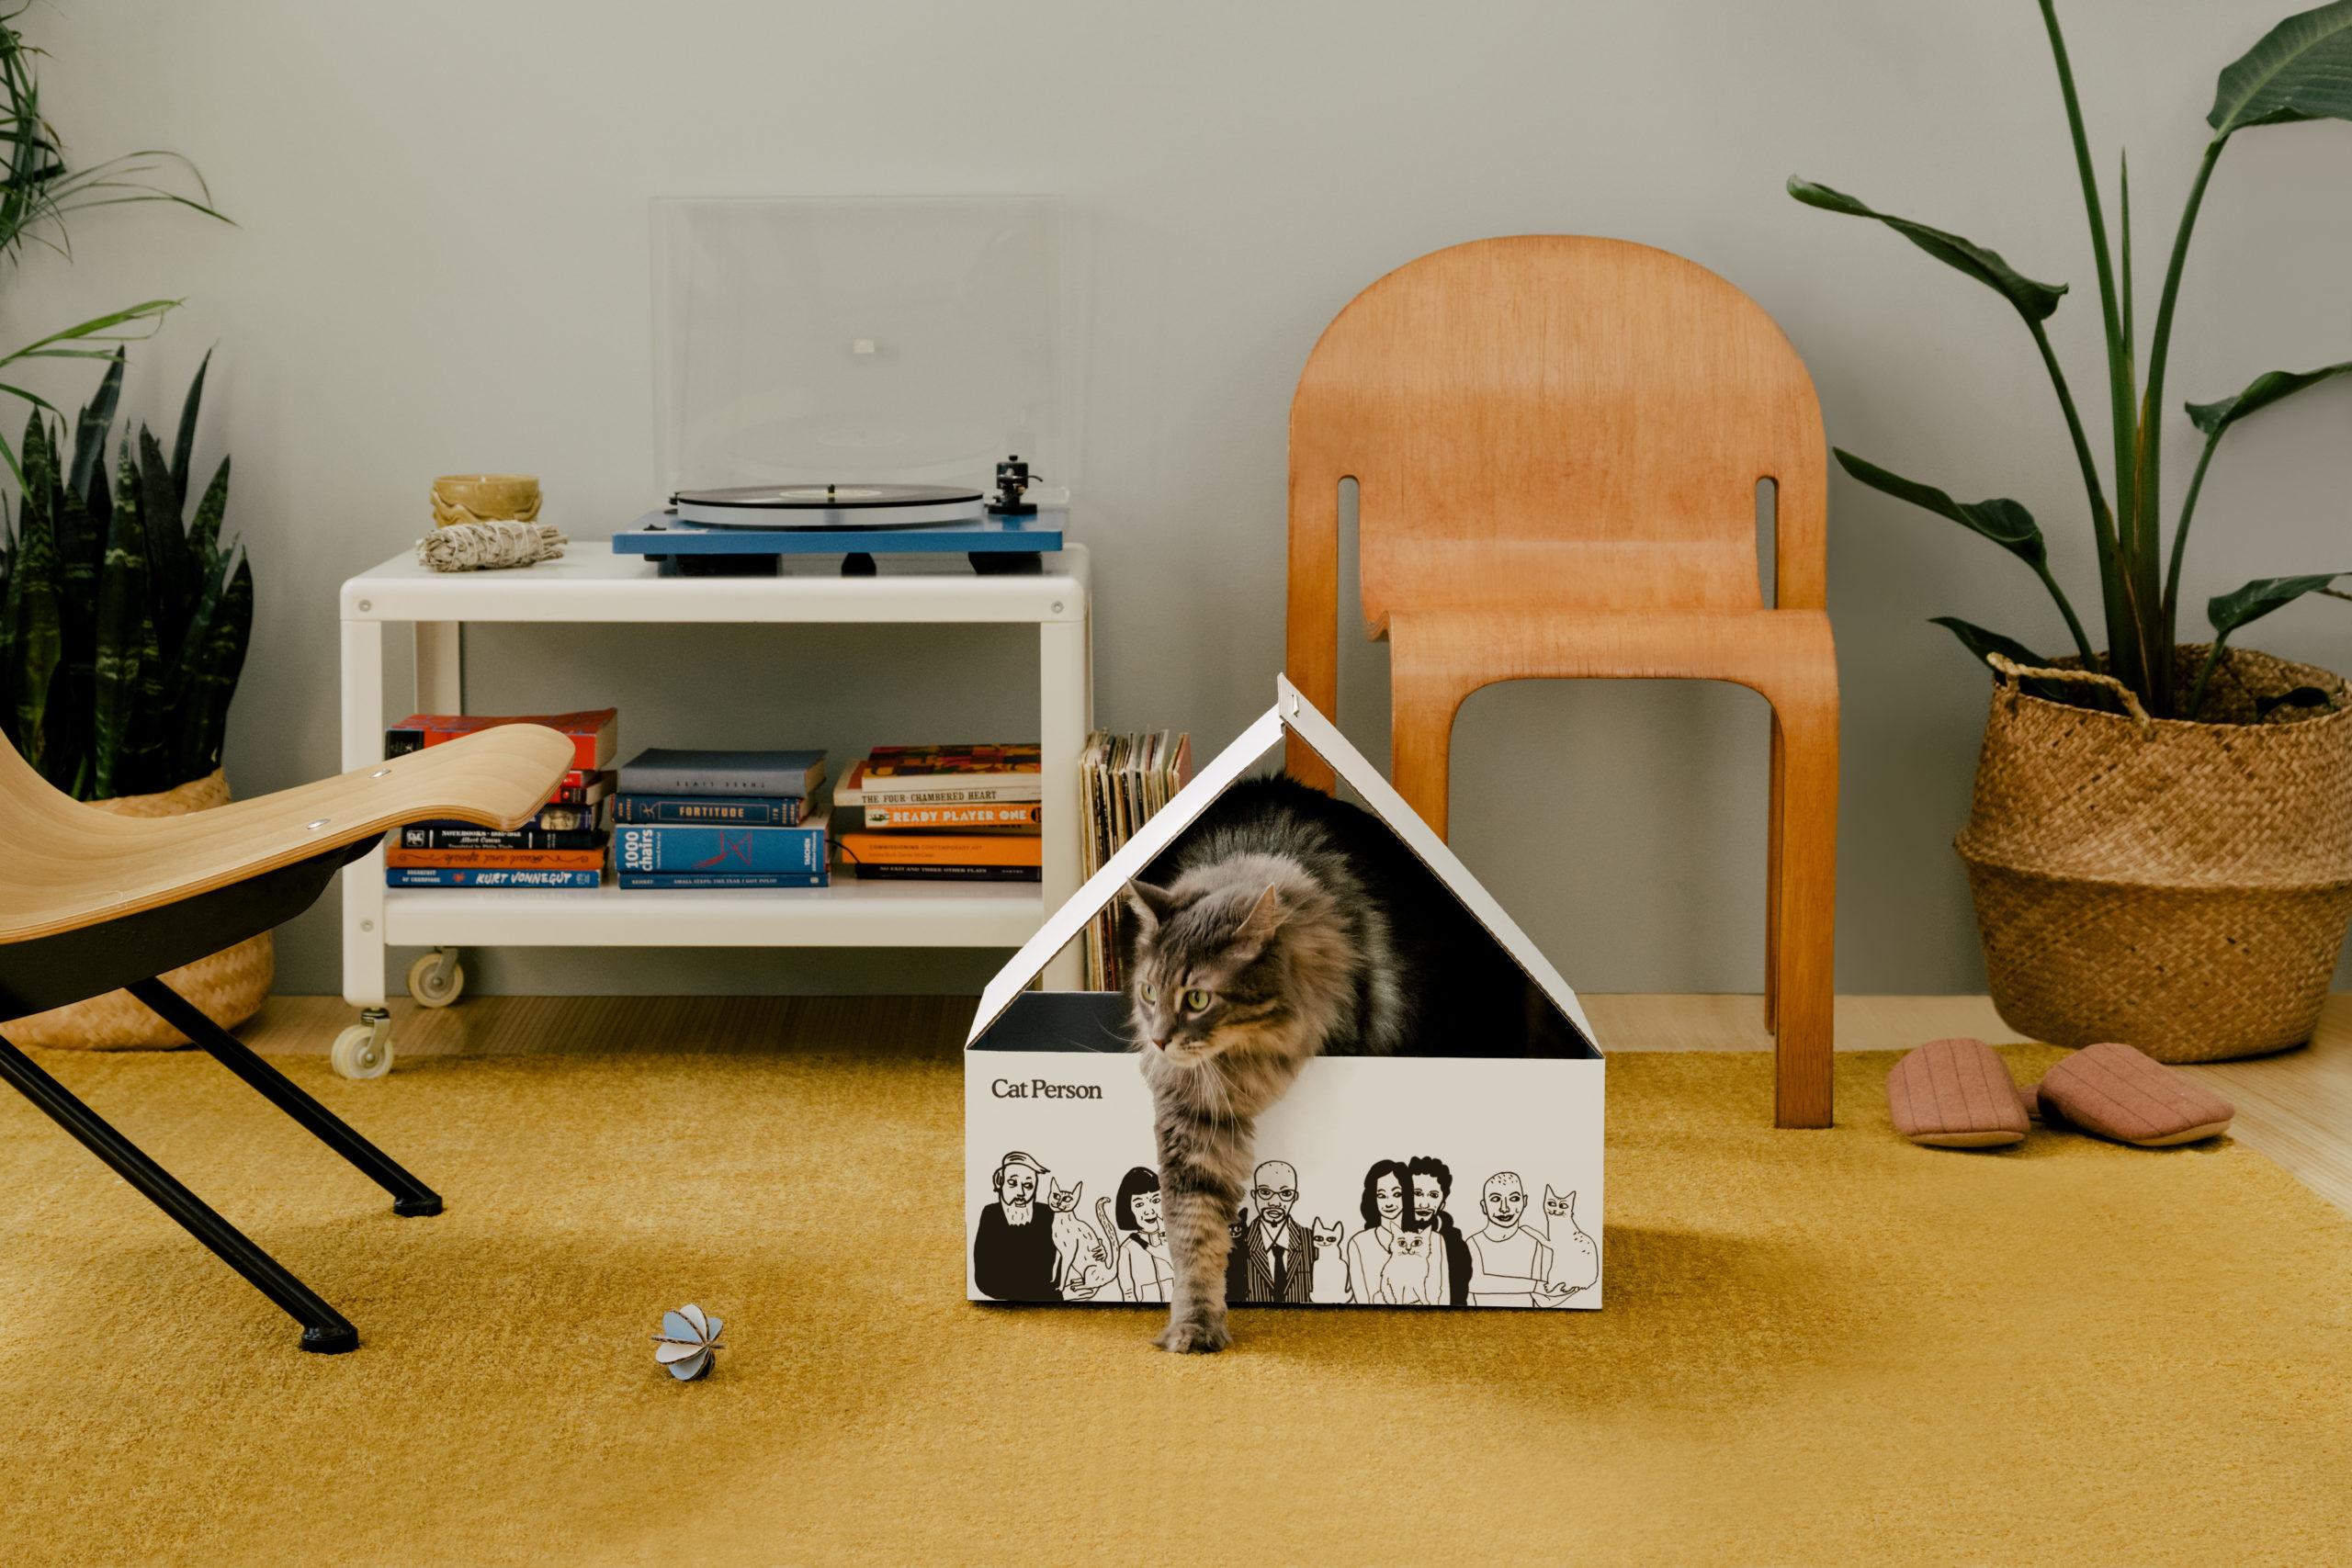 19_11_05 Cat Person_CAT BOX_013